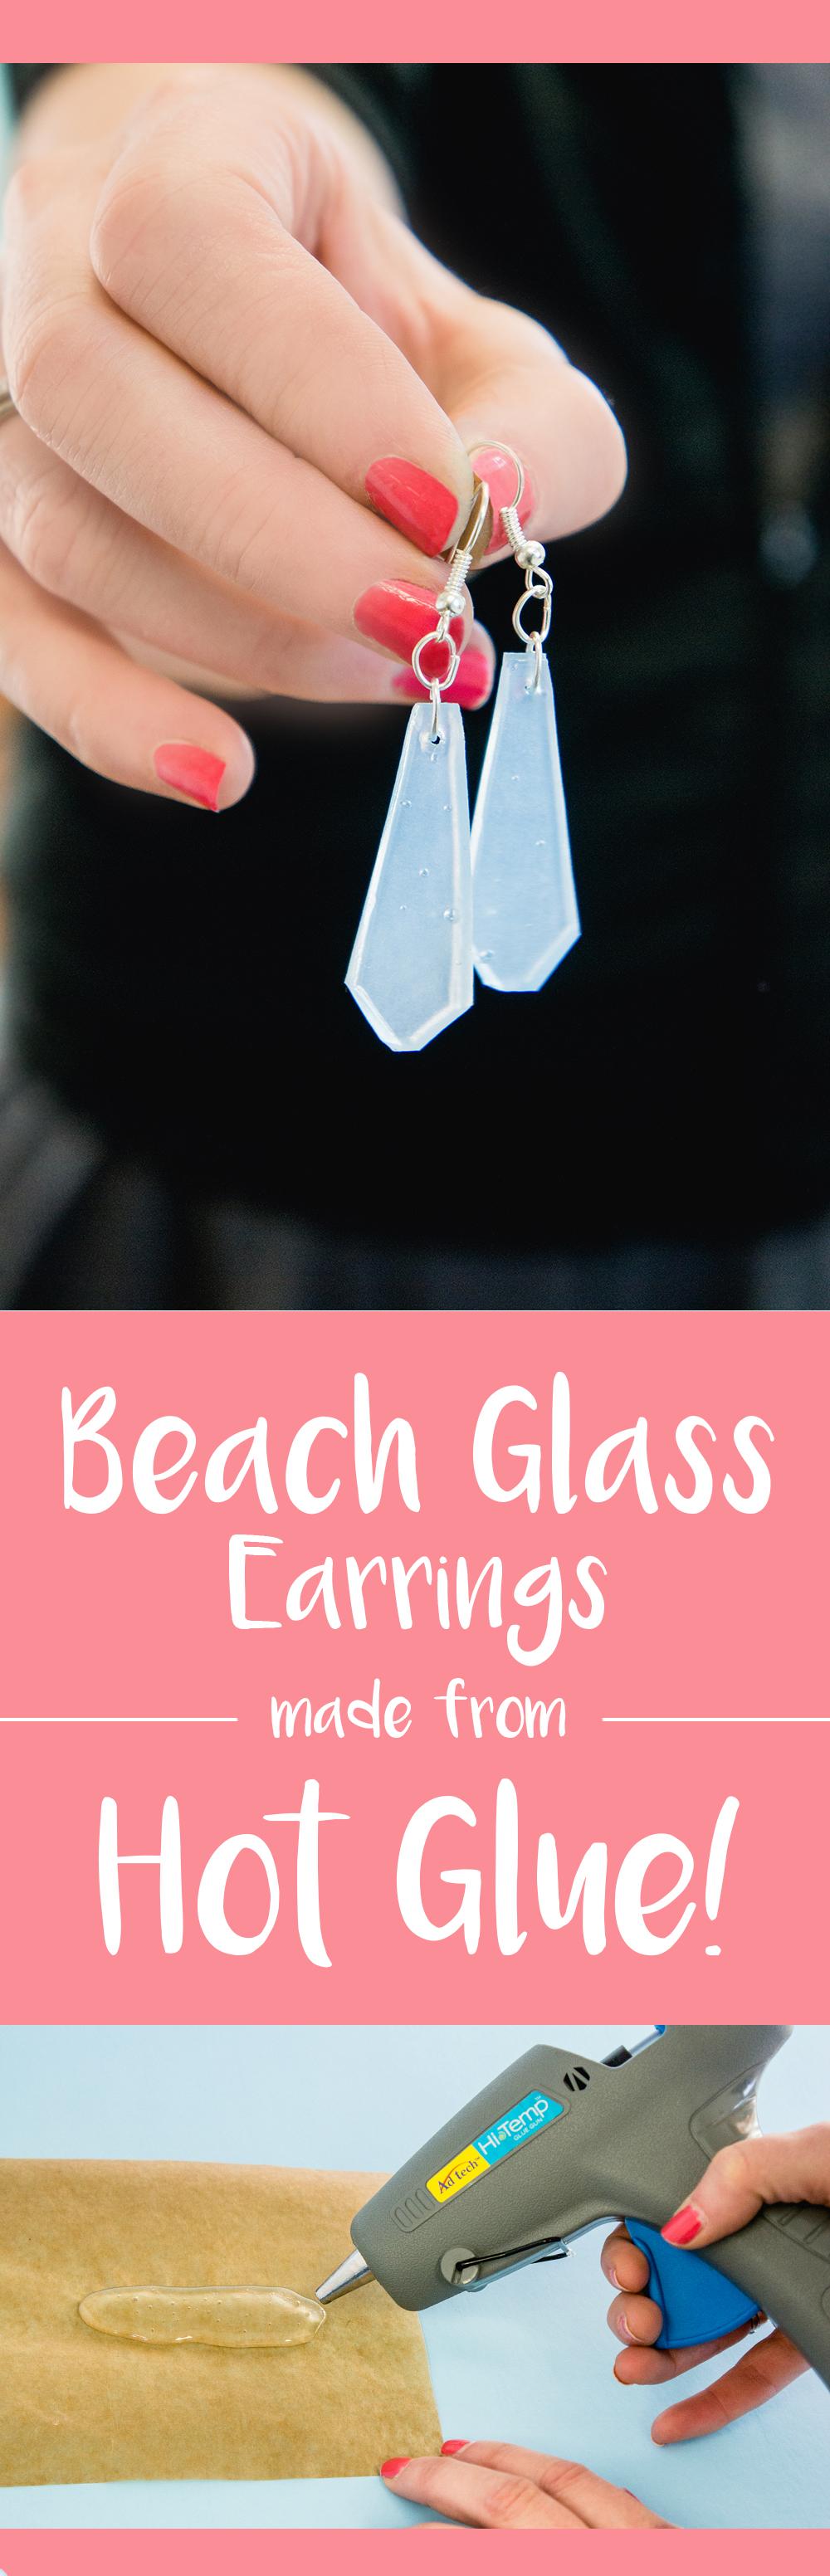 Beach Glass Earrings made with AdTech® Hot Glue - DIY Hot Glue Sea Glass Jewelry